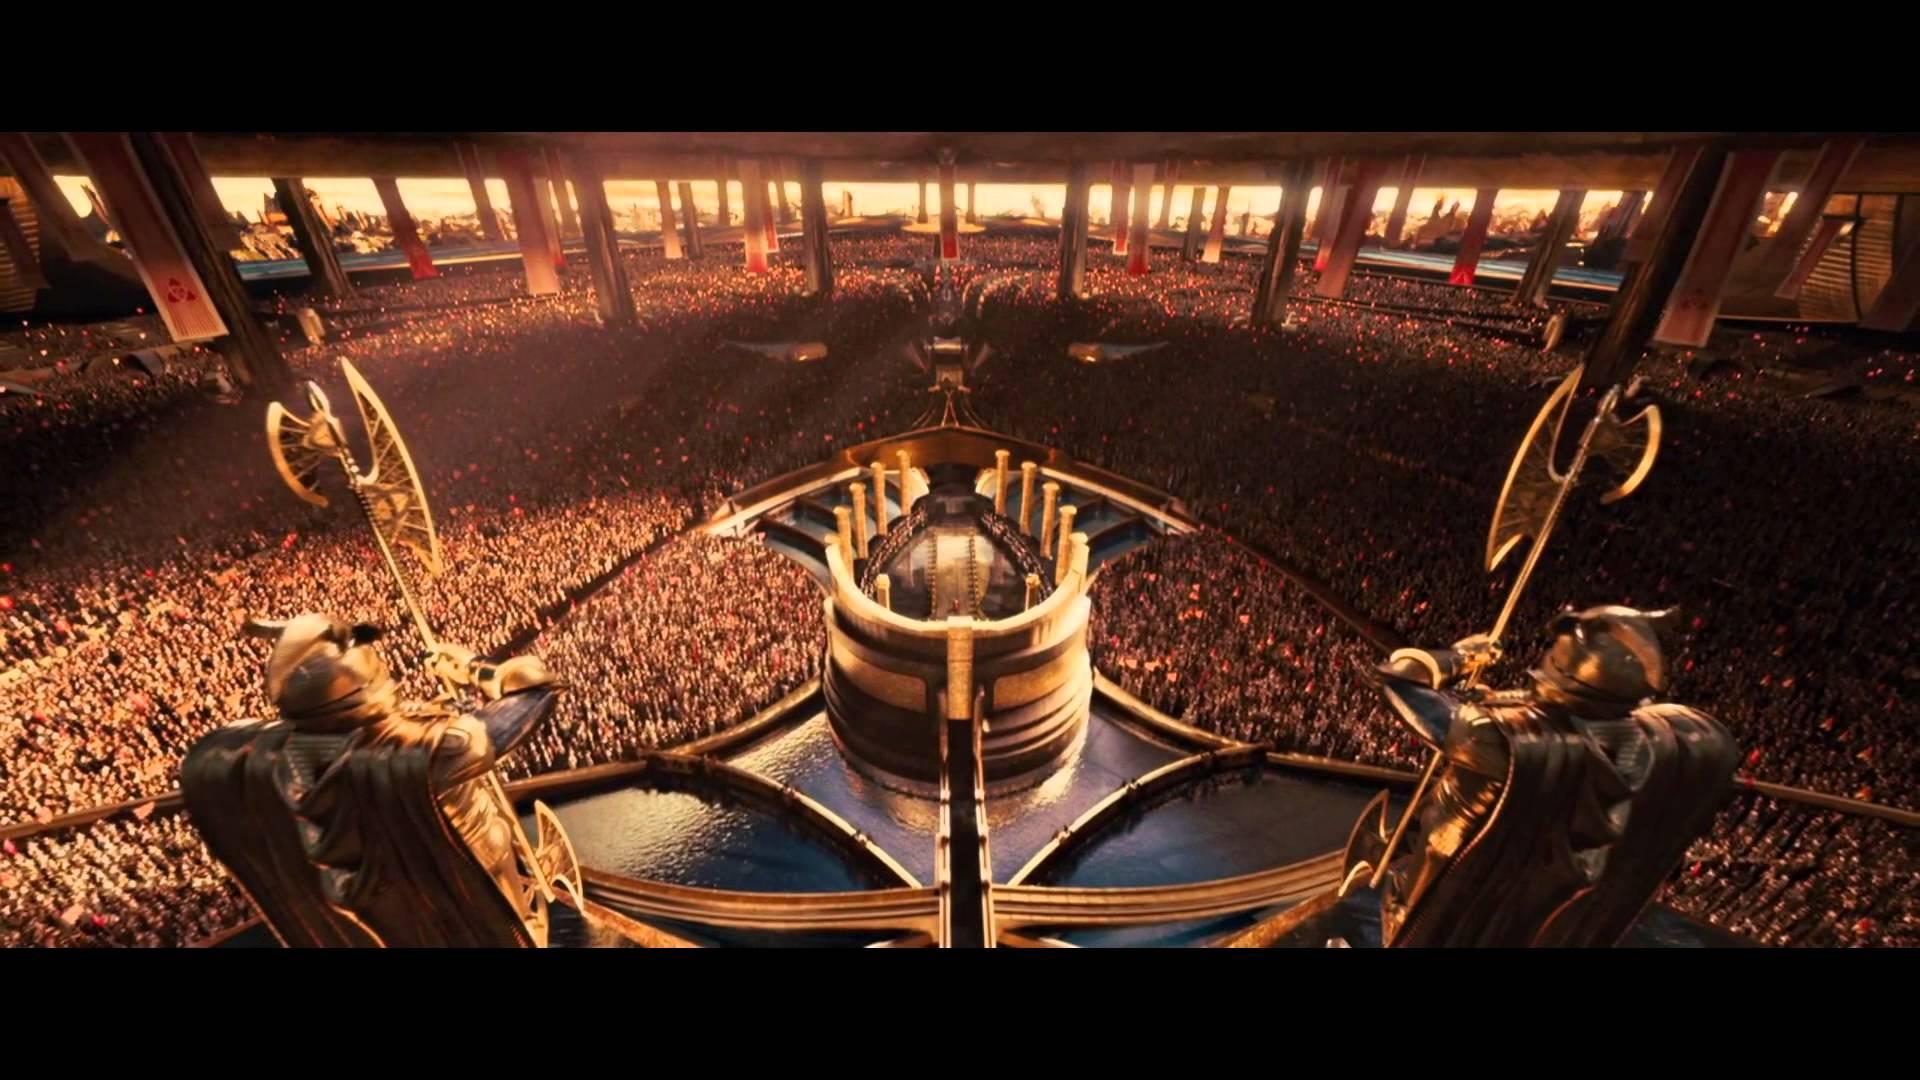 maxresdefault3 - Thor 2: The Dark World la bande-annonce